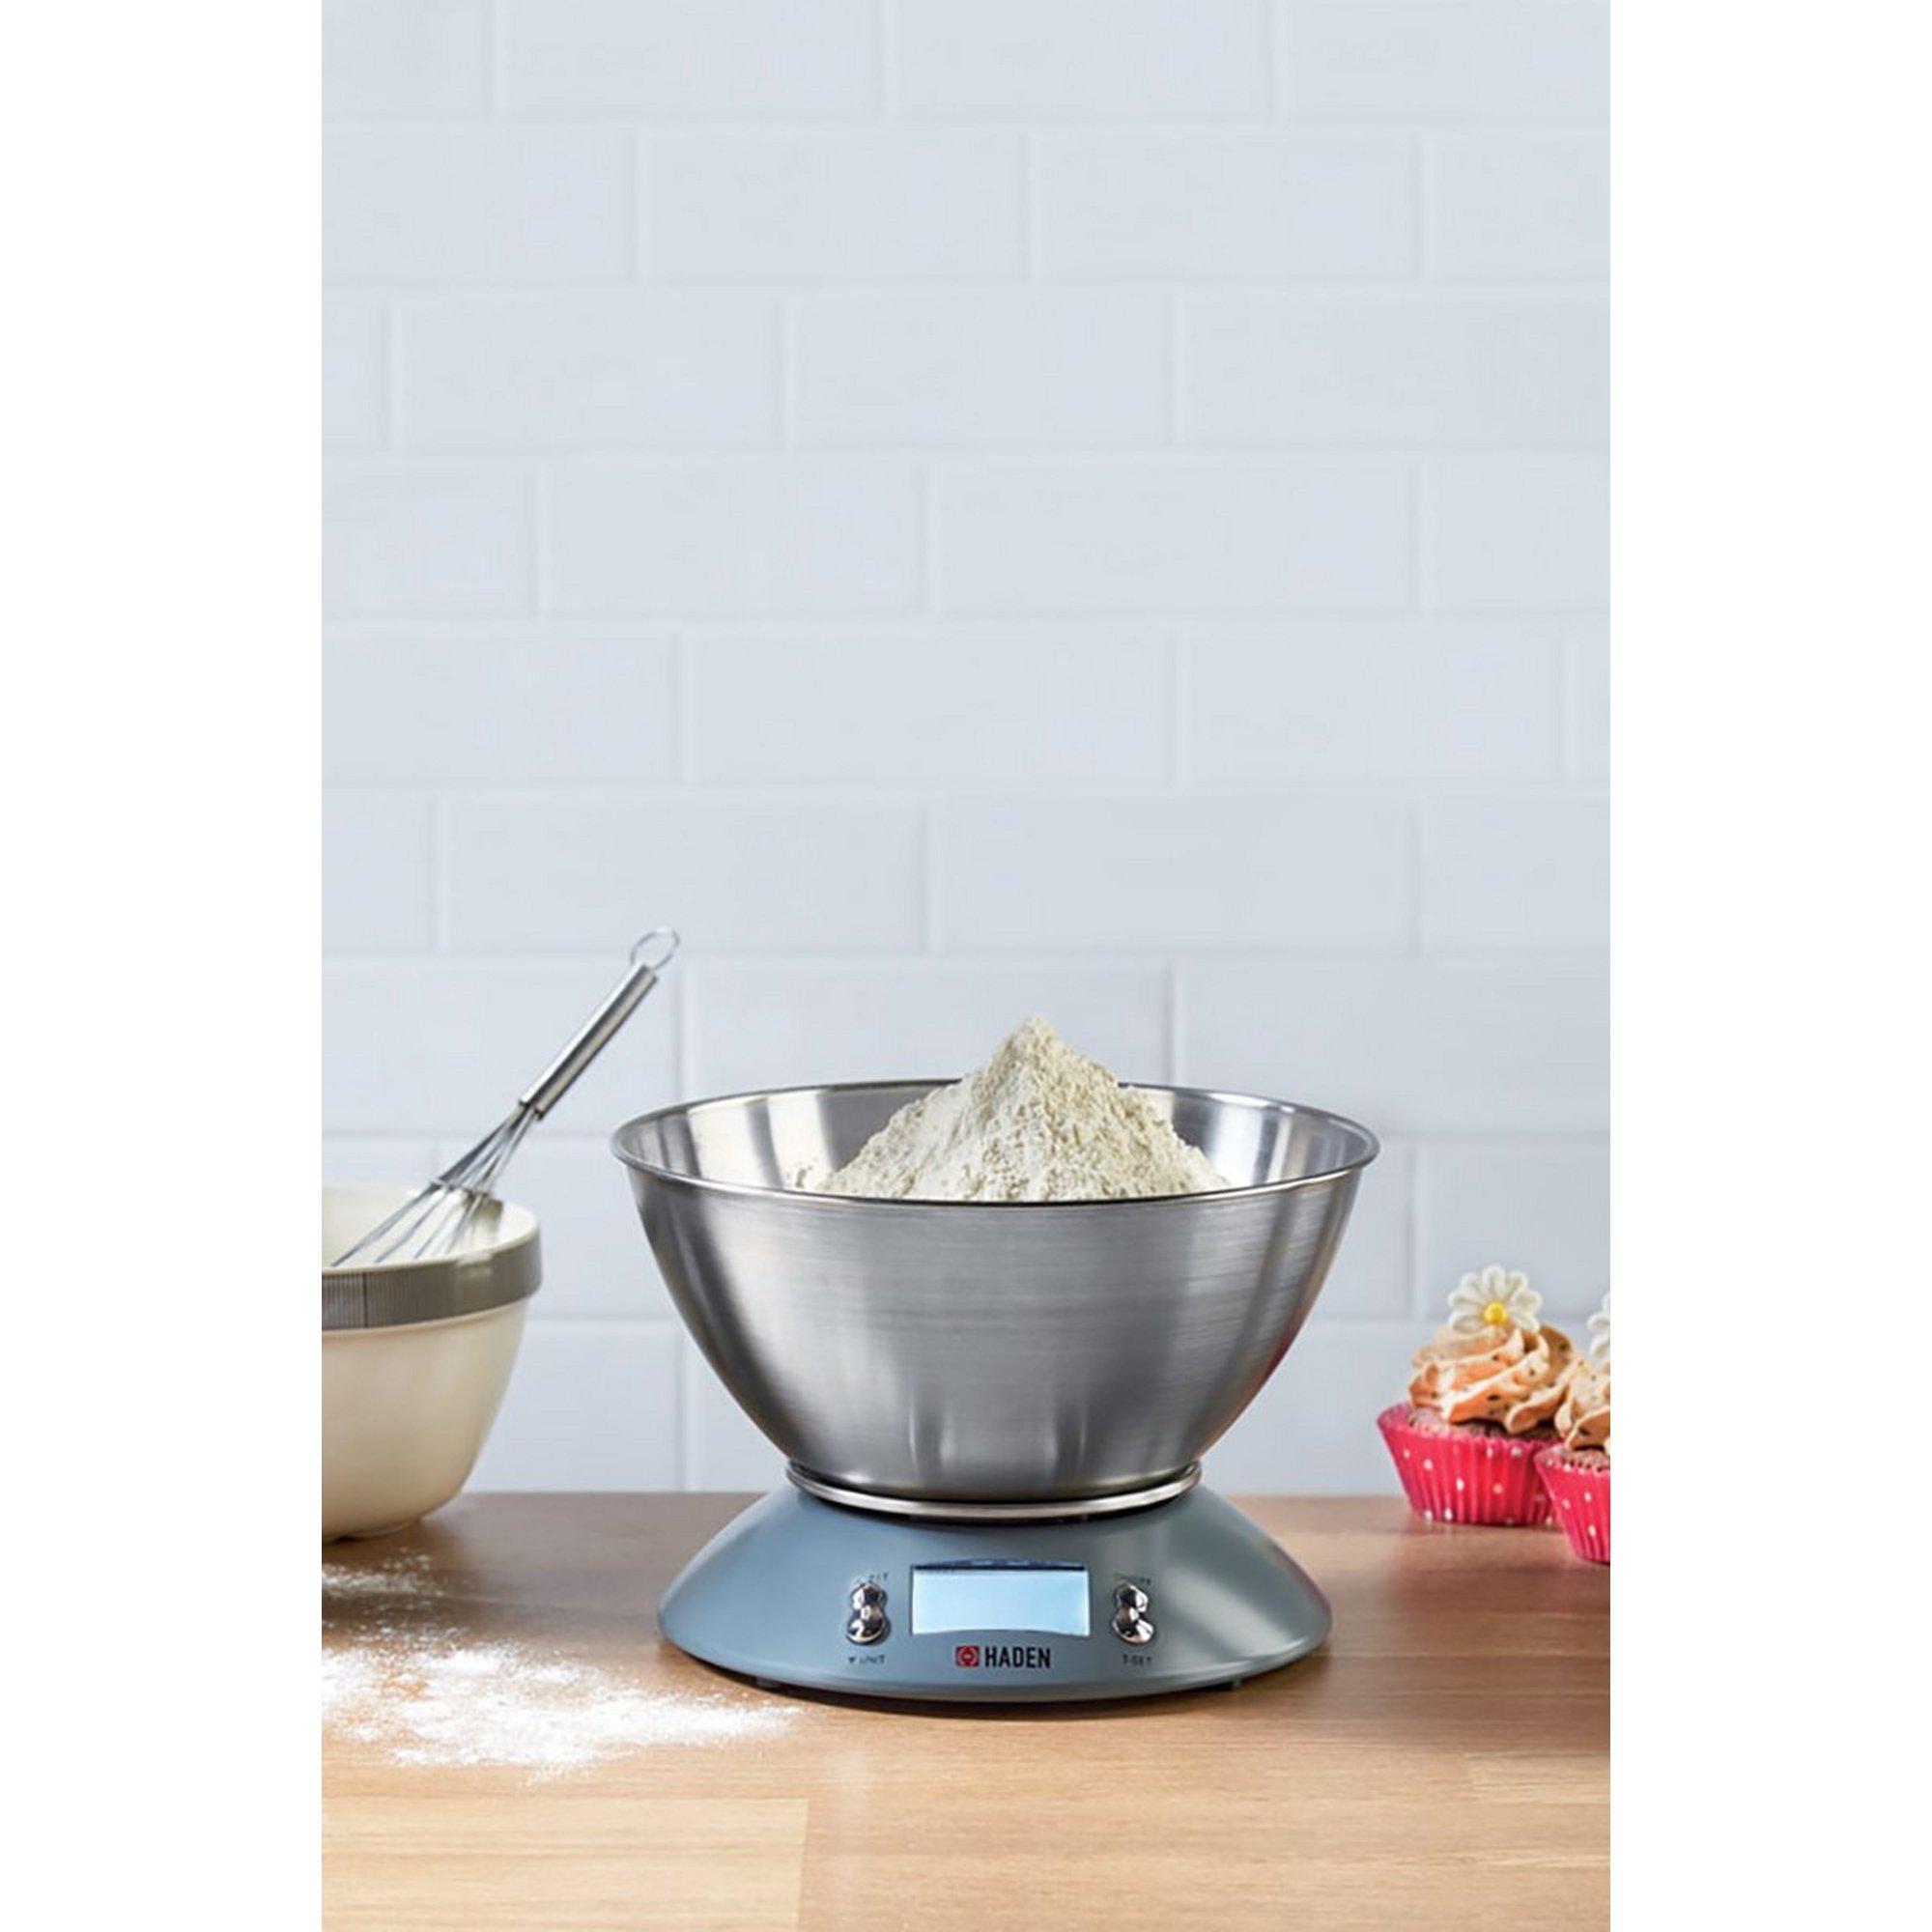 Image of Haden Perth Digital Bowl Scales